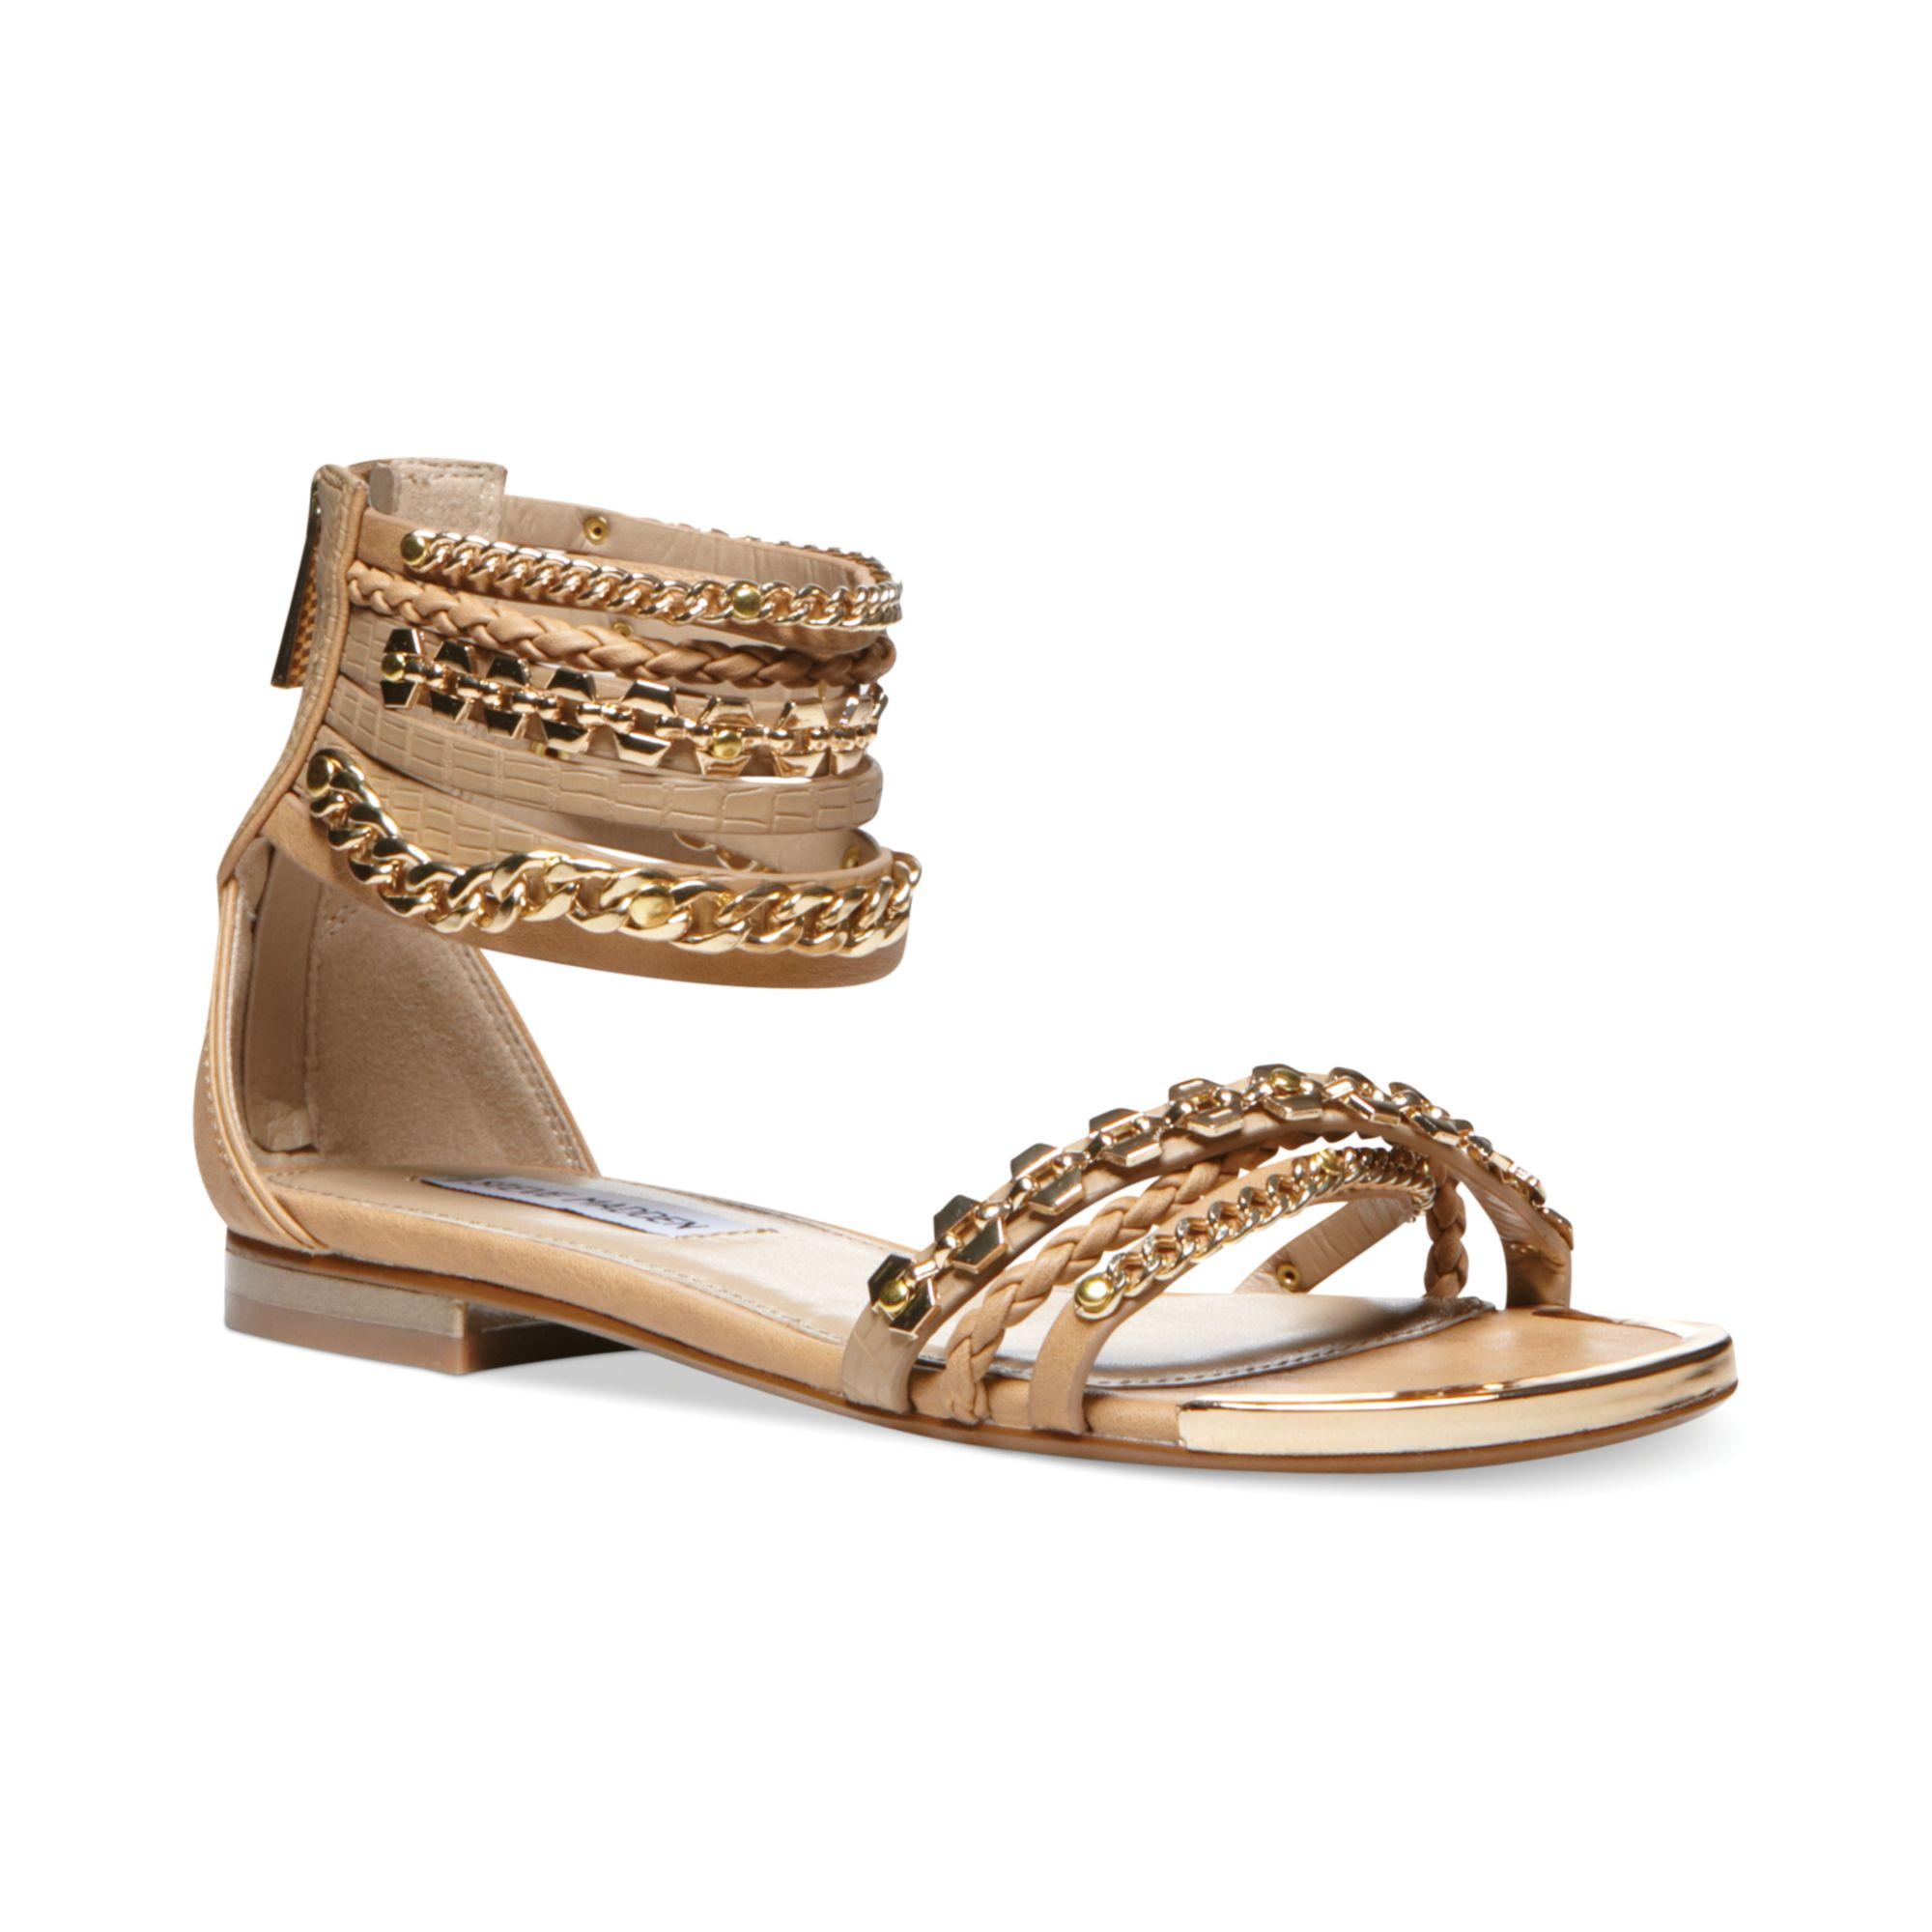 Steve Madden Womens Lawful Flat Sandals In Metallic Lyst